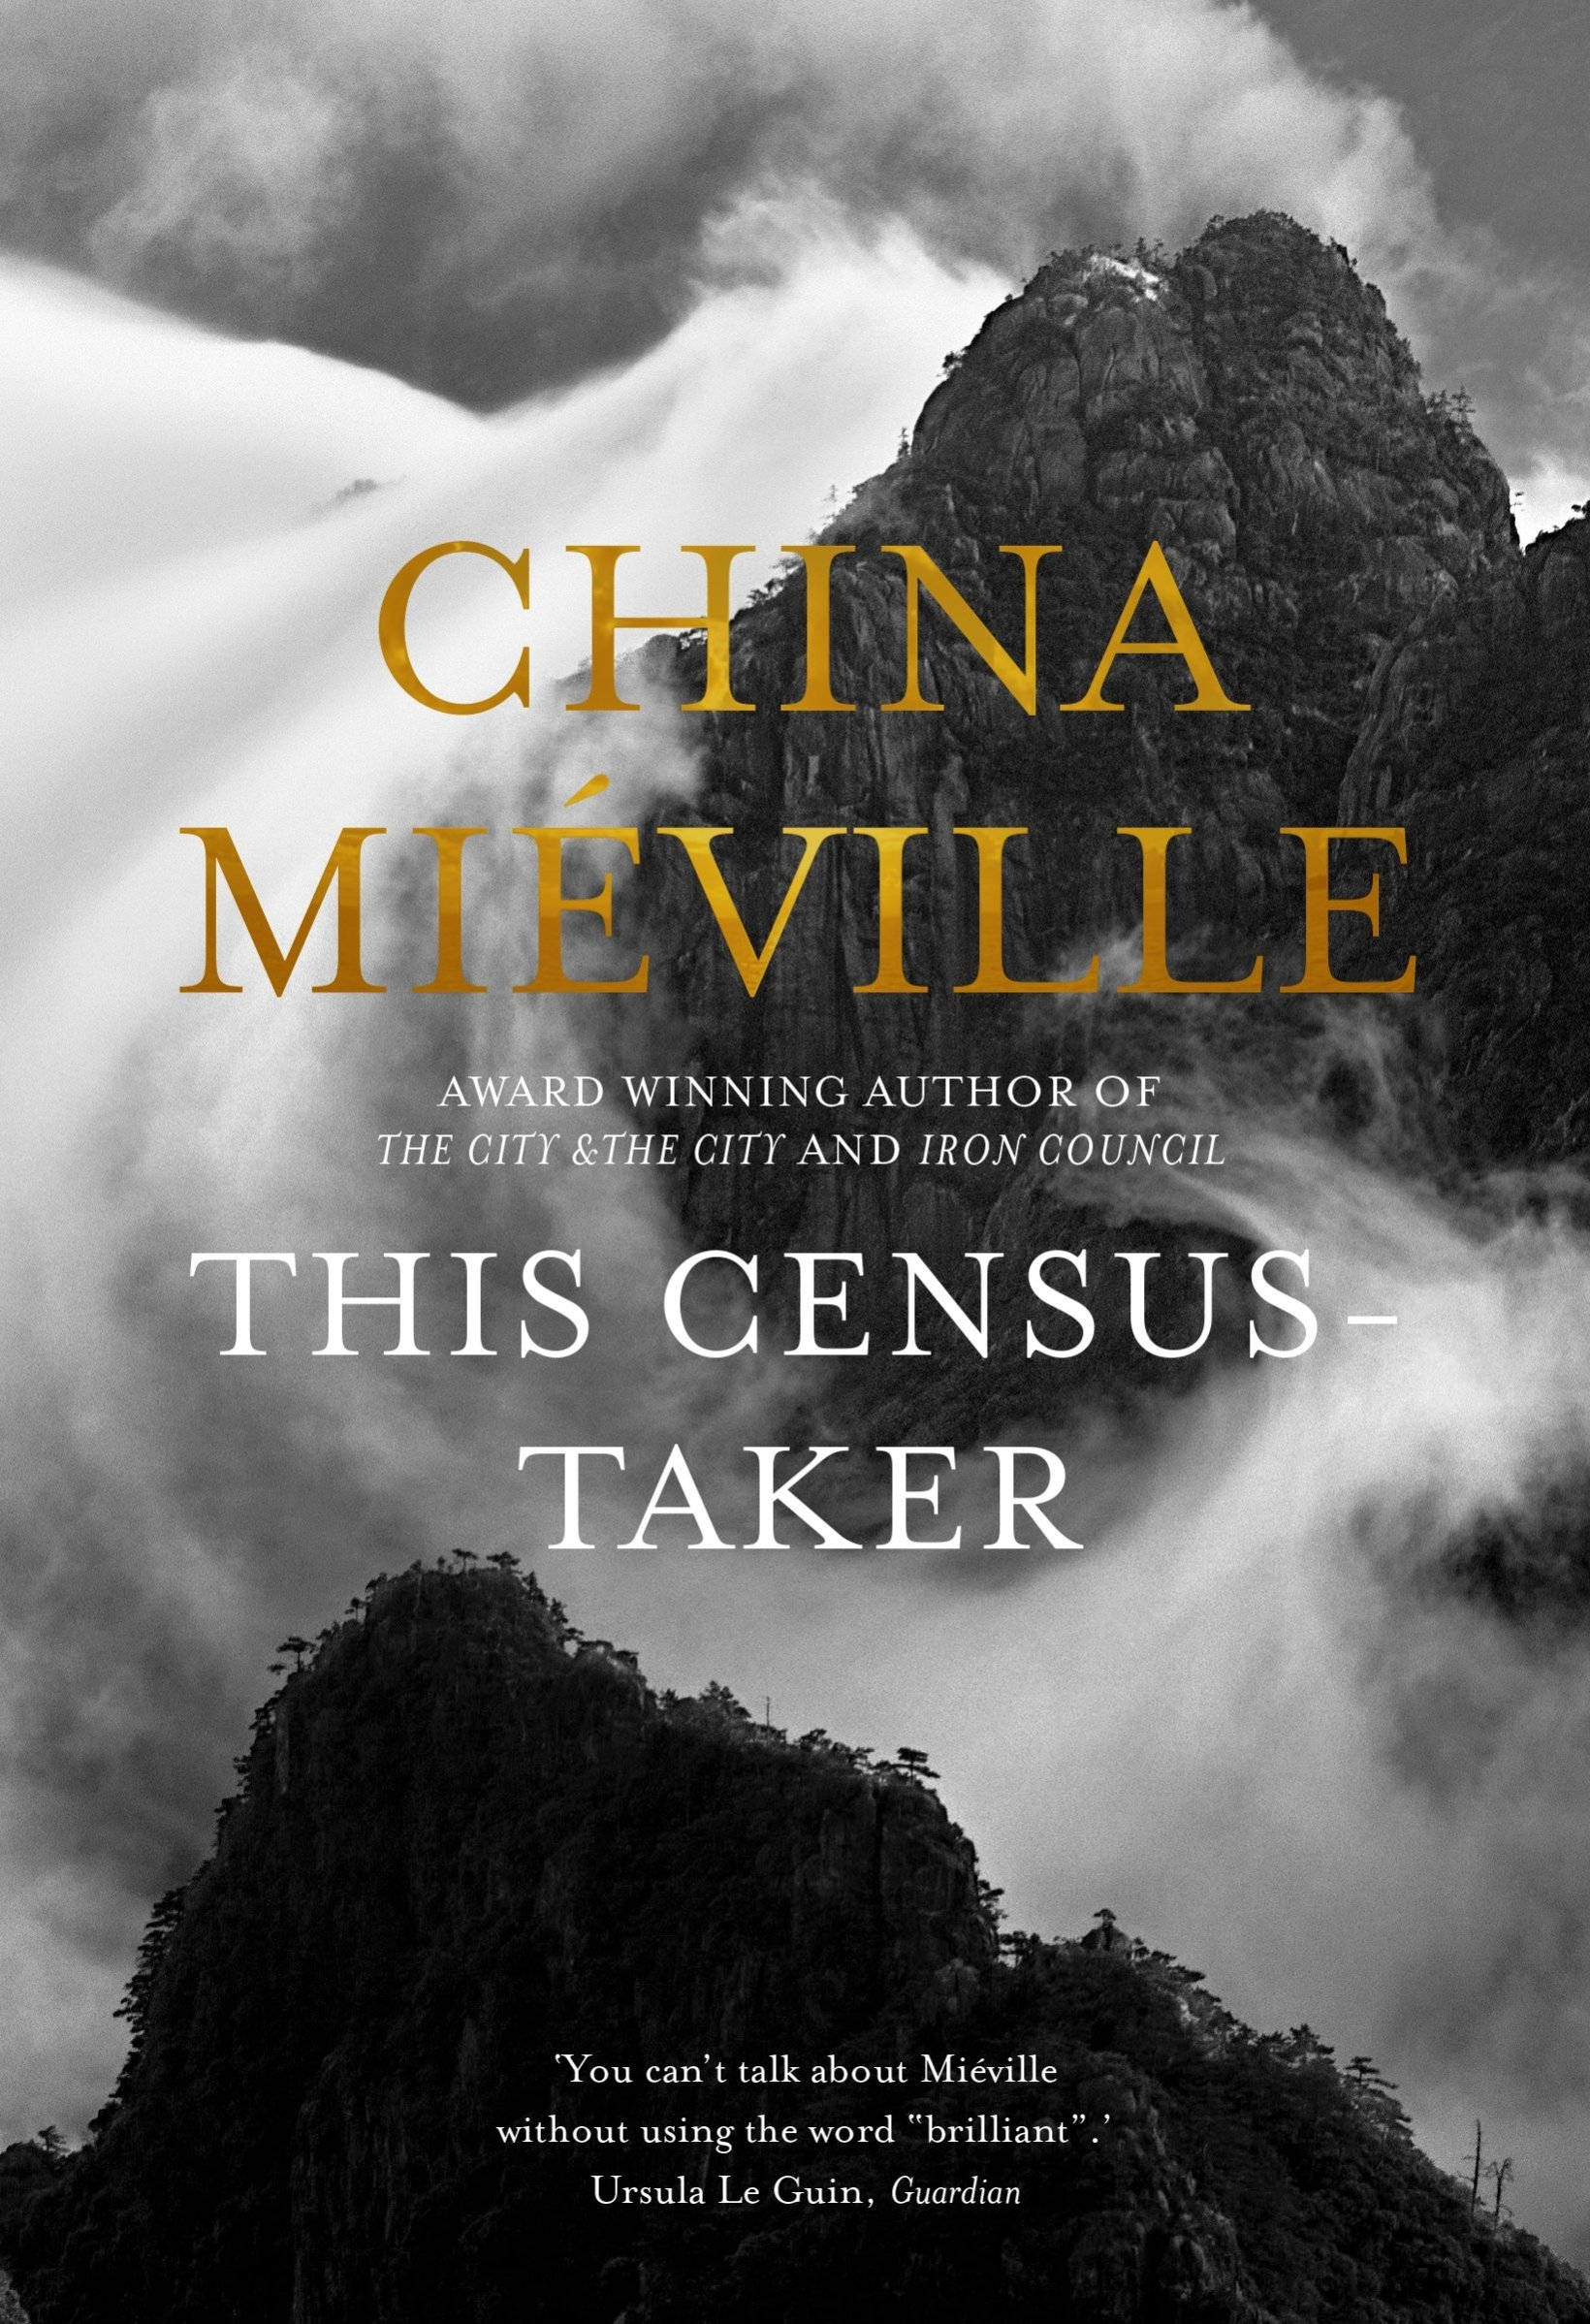 This Census-Taker – China Miéville